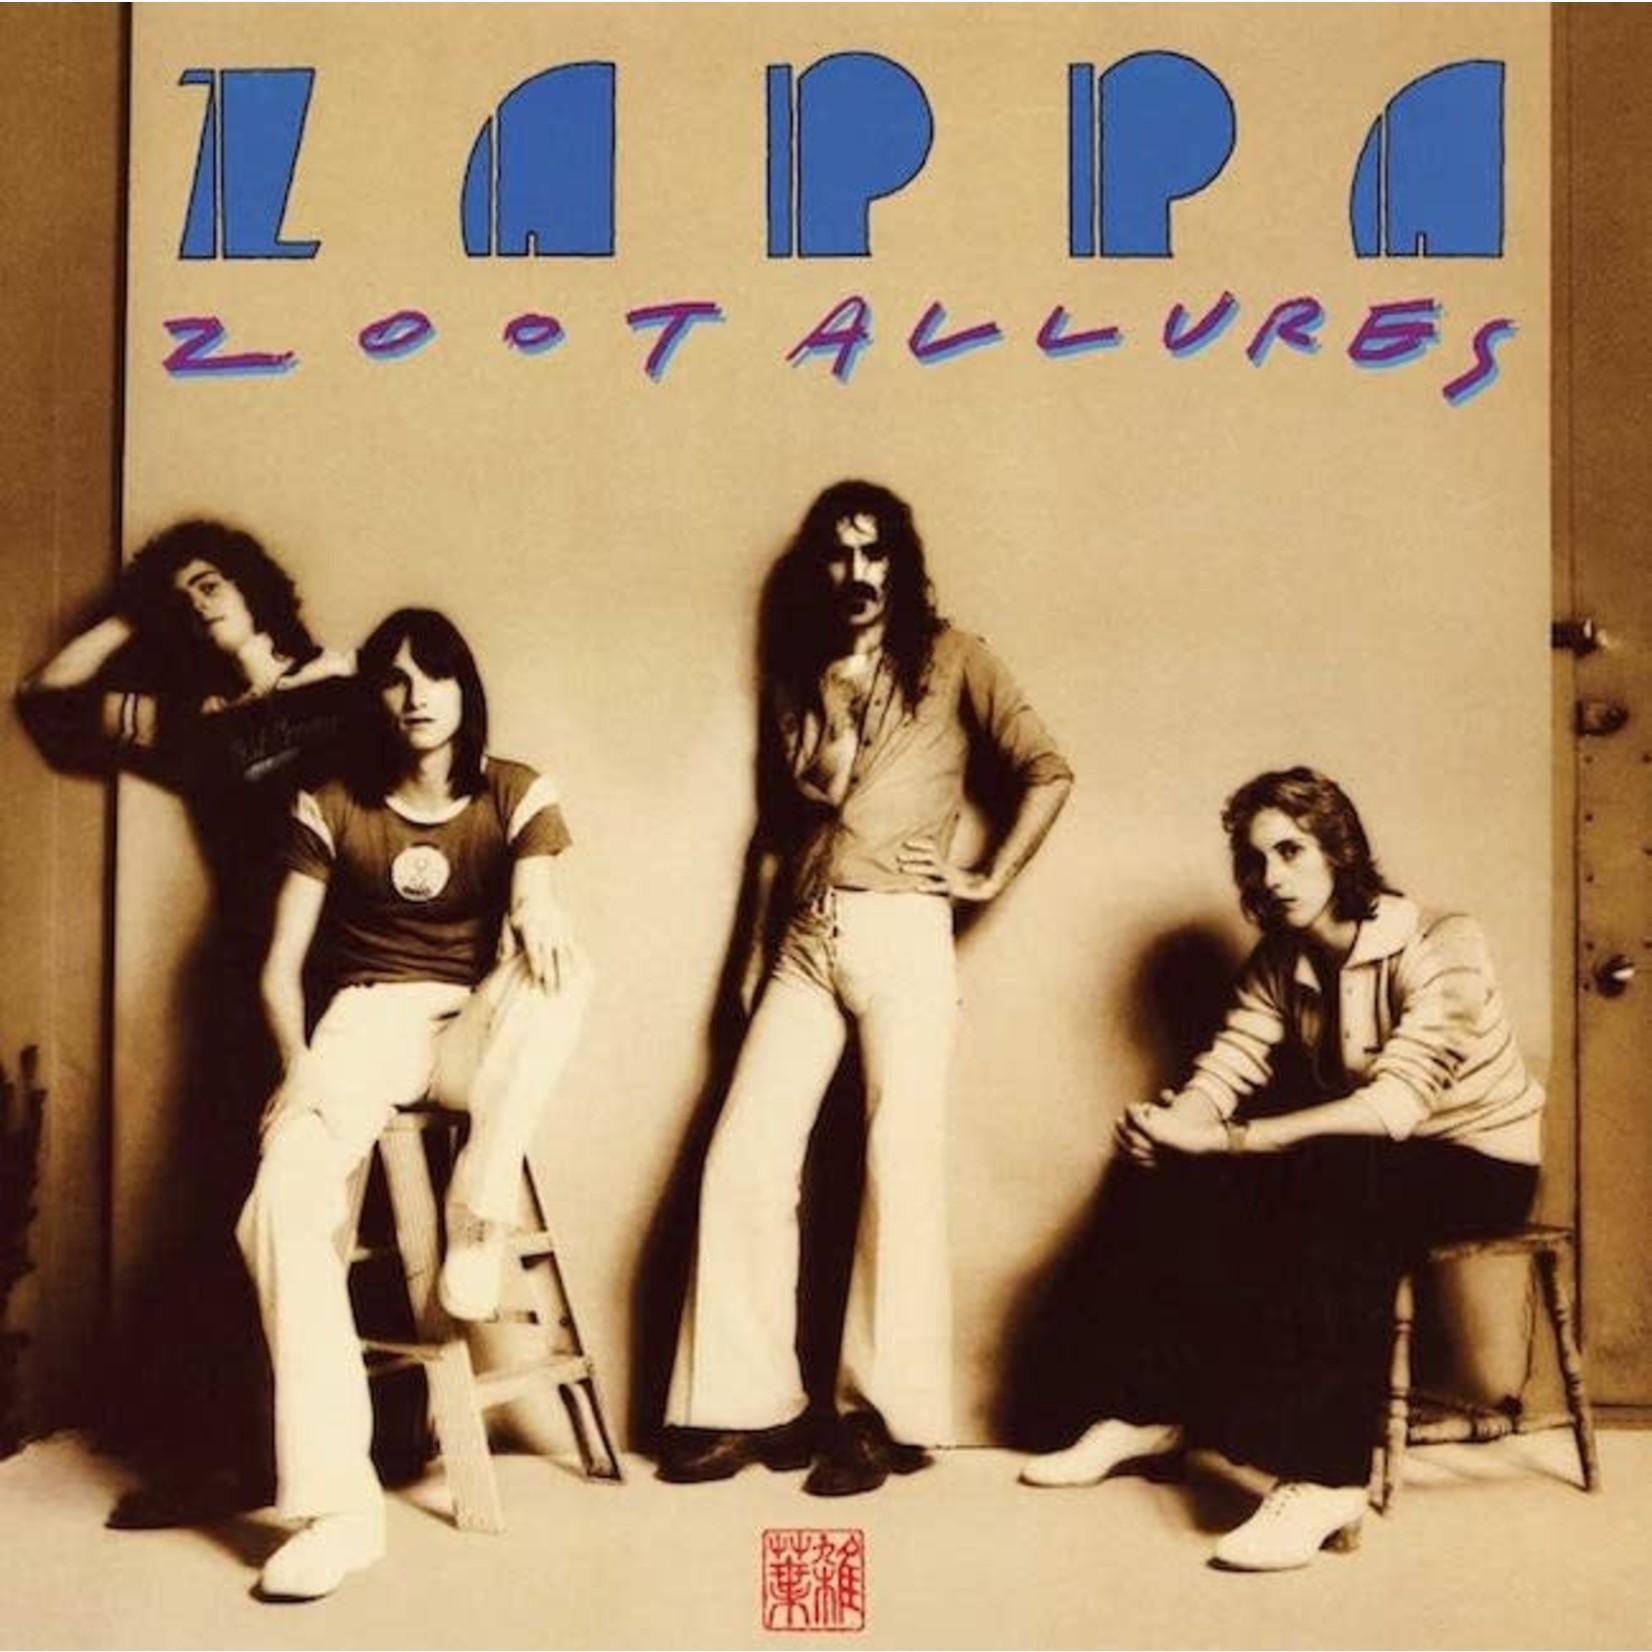 [Vintage] Zappa, Frank: Zoot Allures